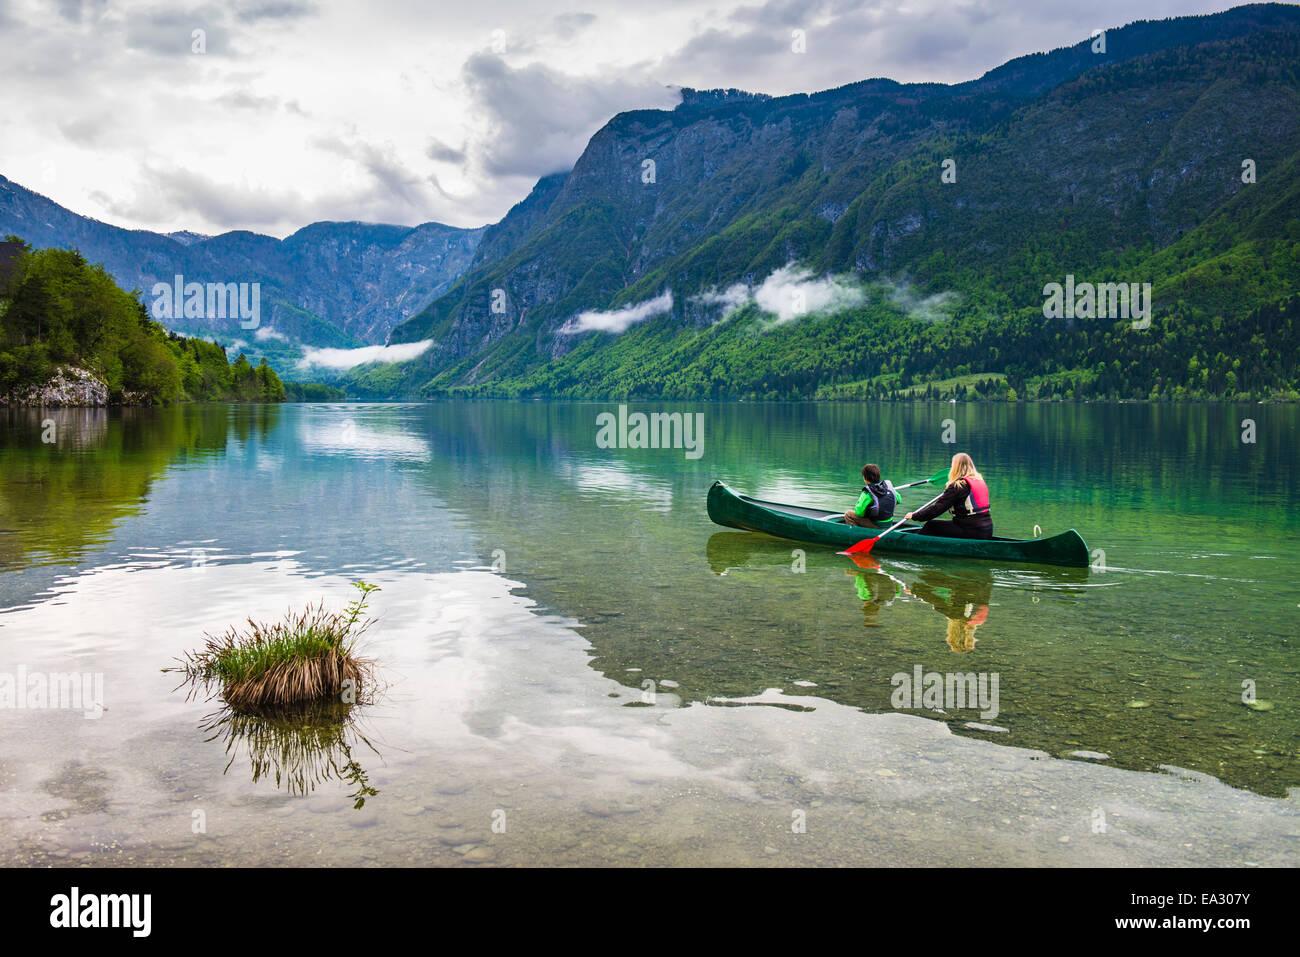 Mother and son canoeing on Lake Bohinj, Triglav National Park, Julian Alps, Slovenia, Europe - Stock Image